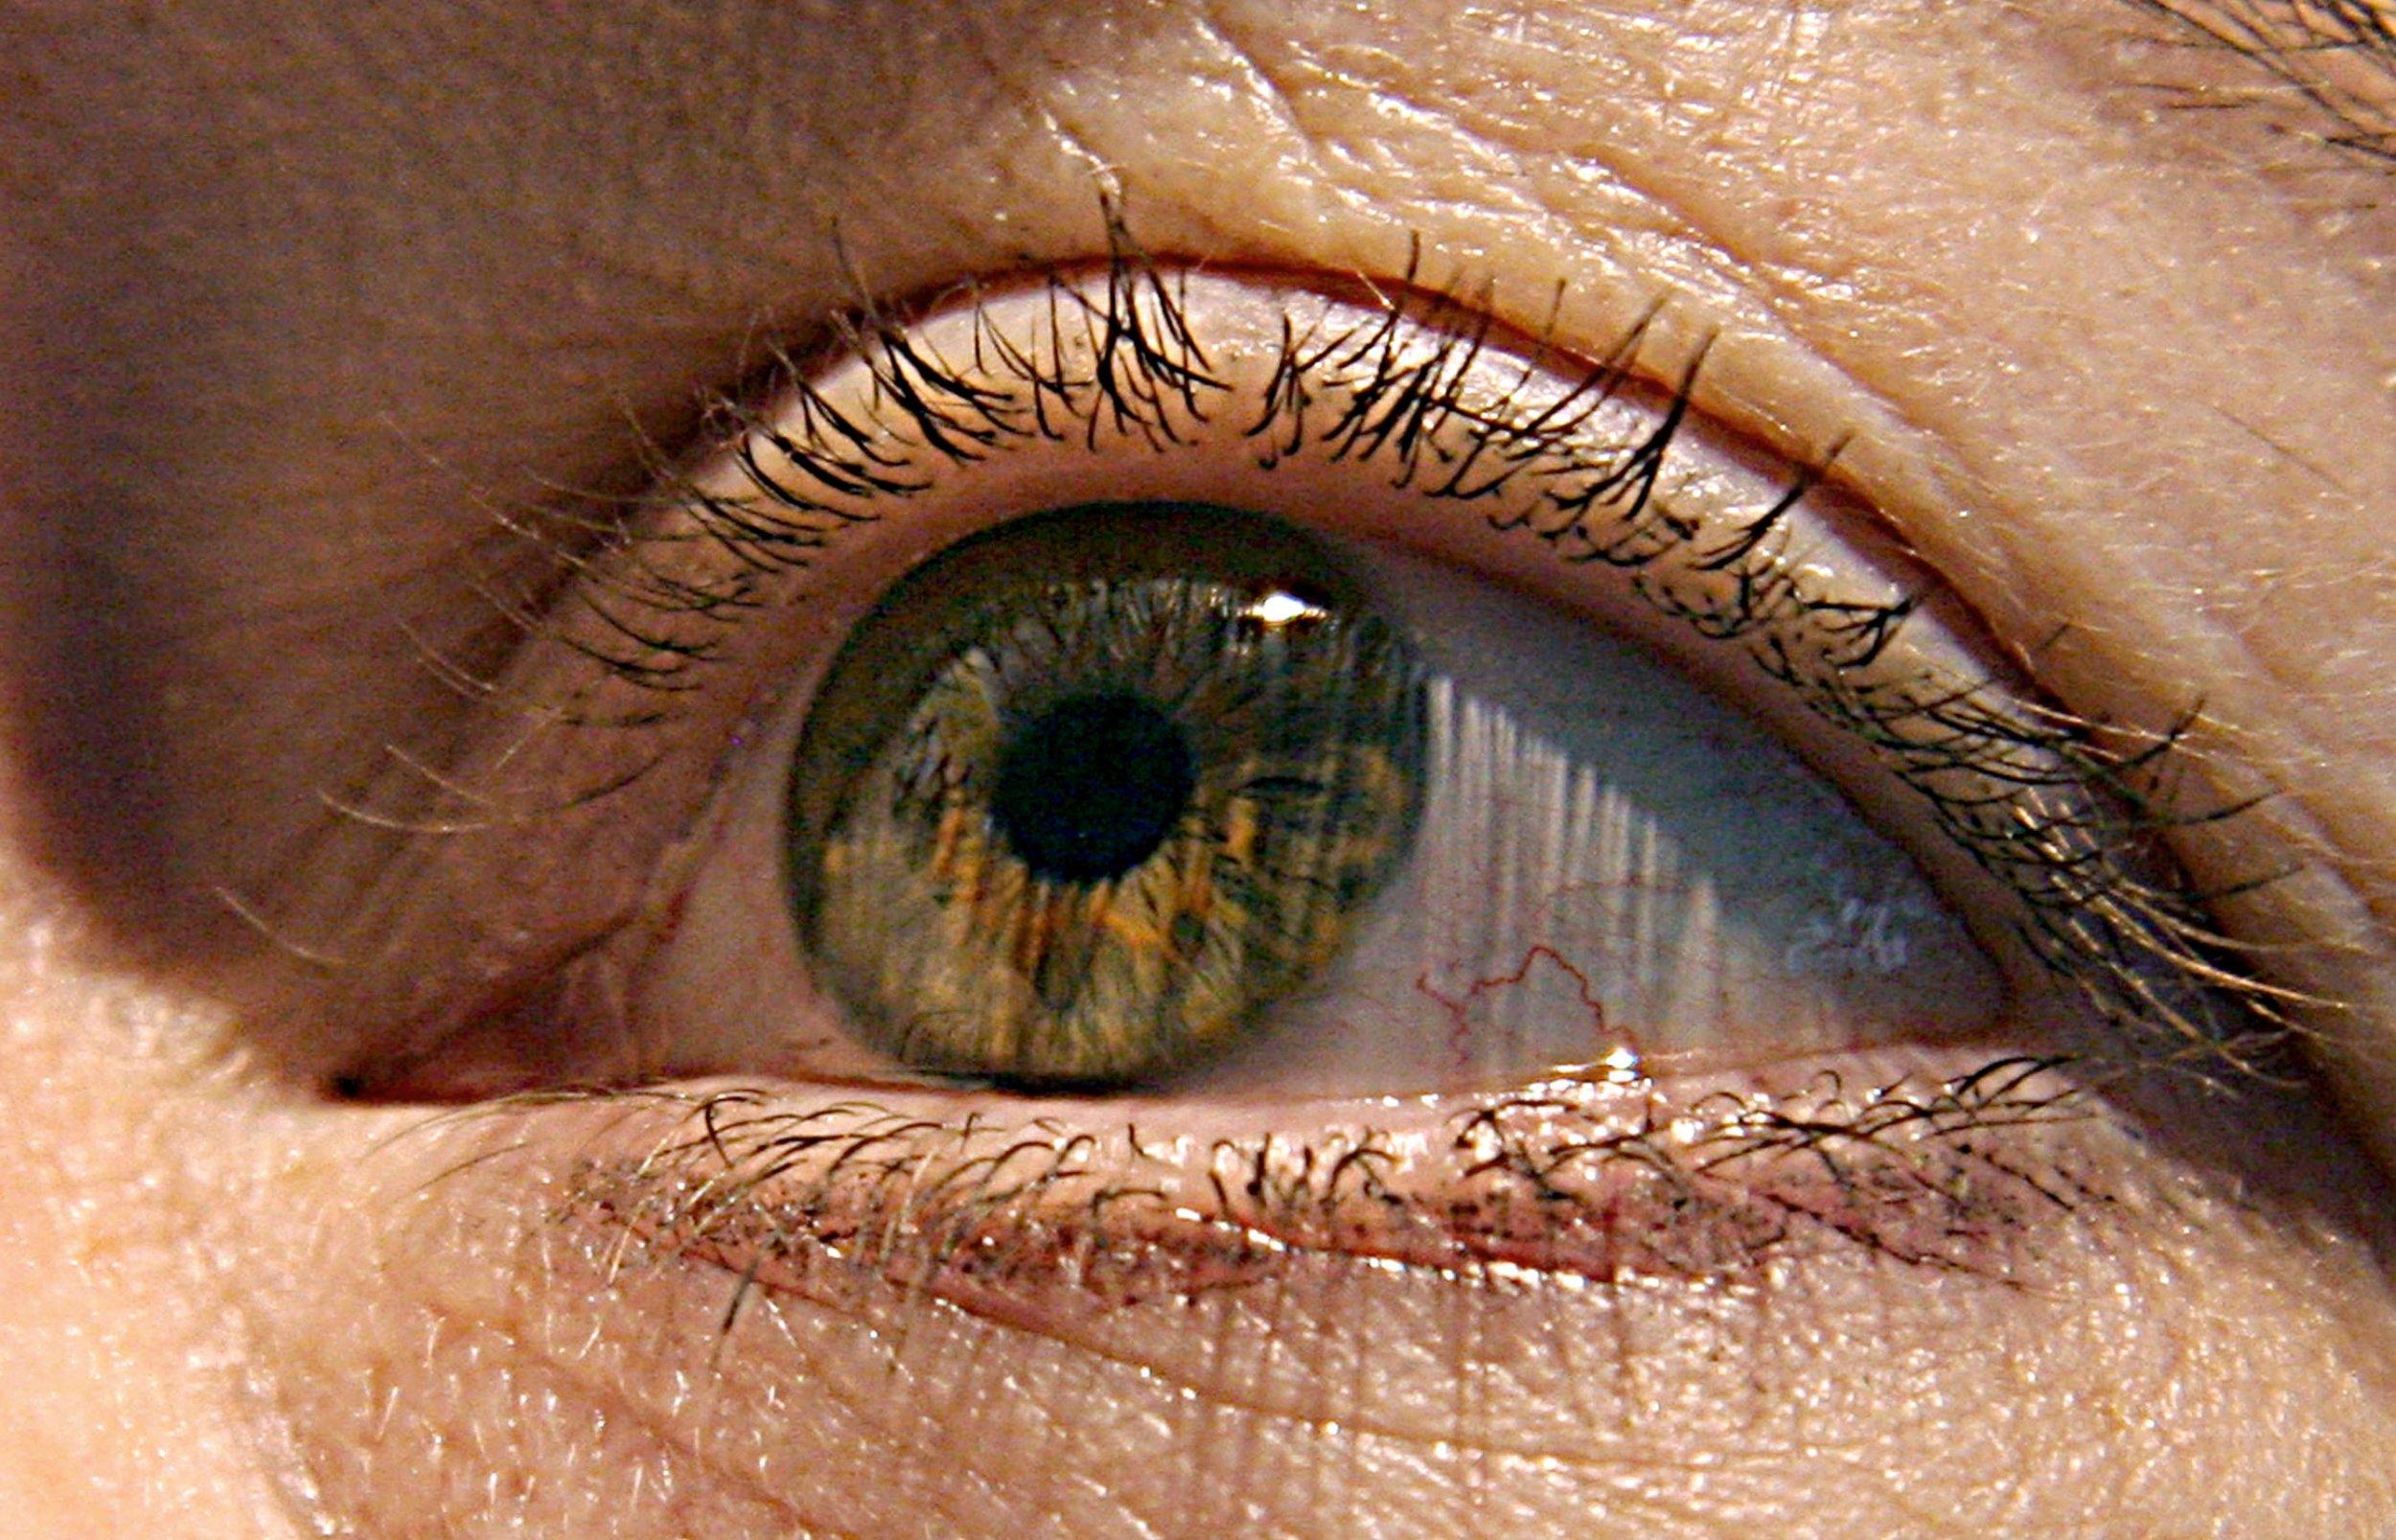 09_24_Eyeball